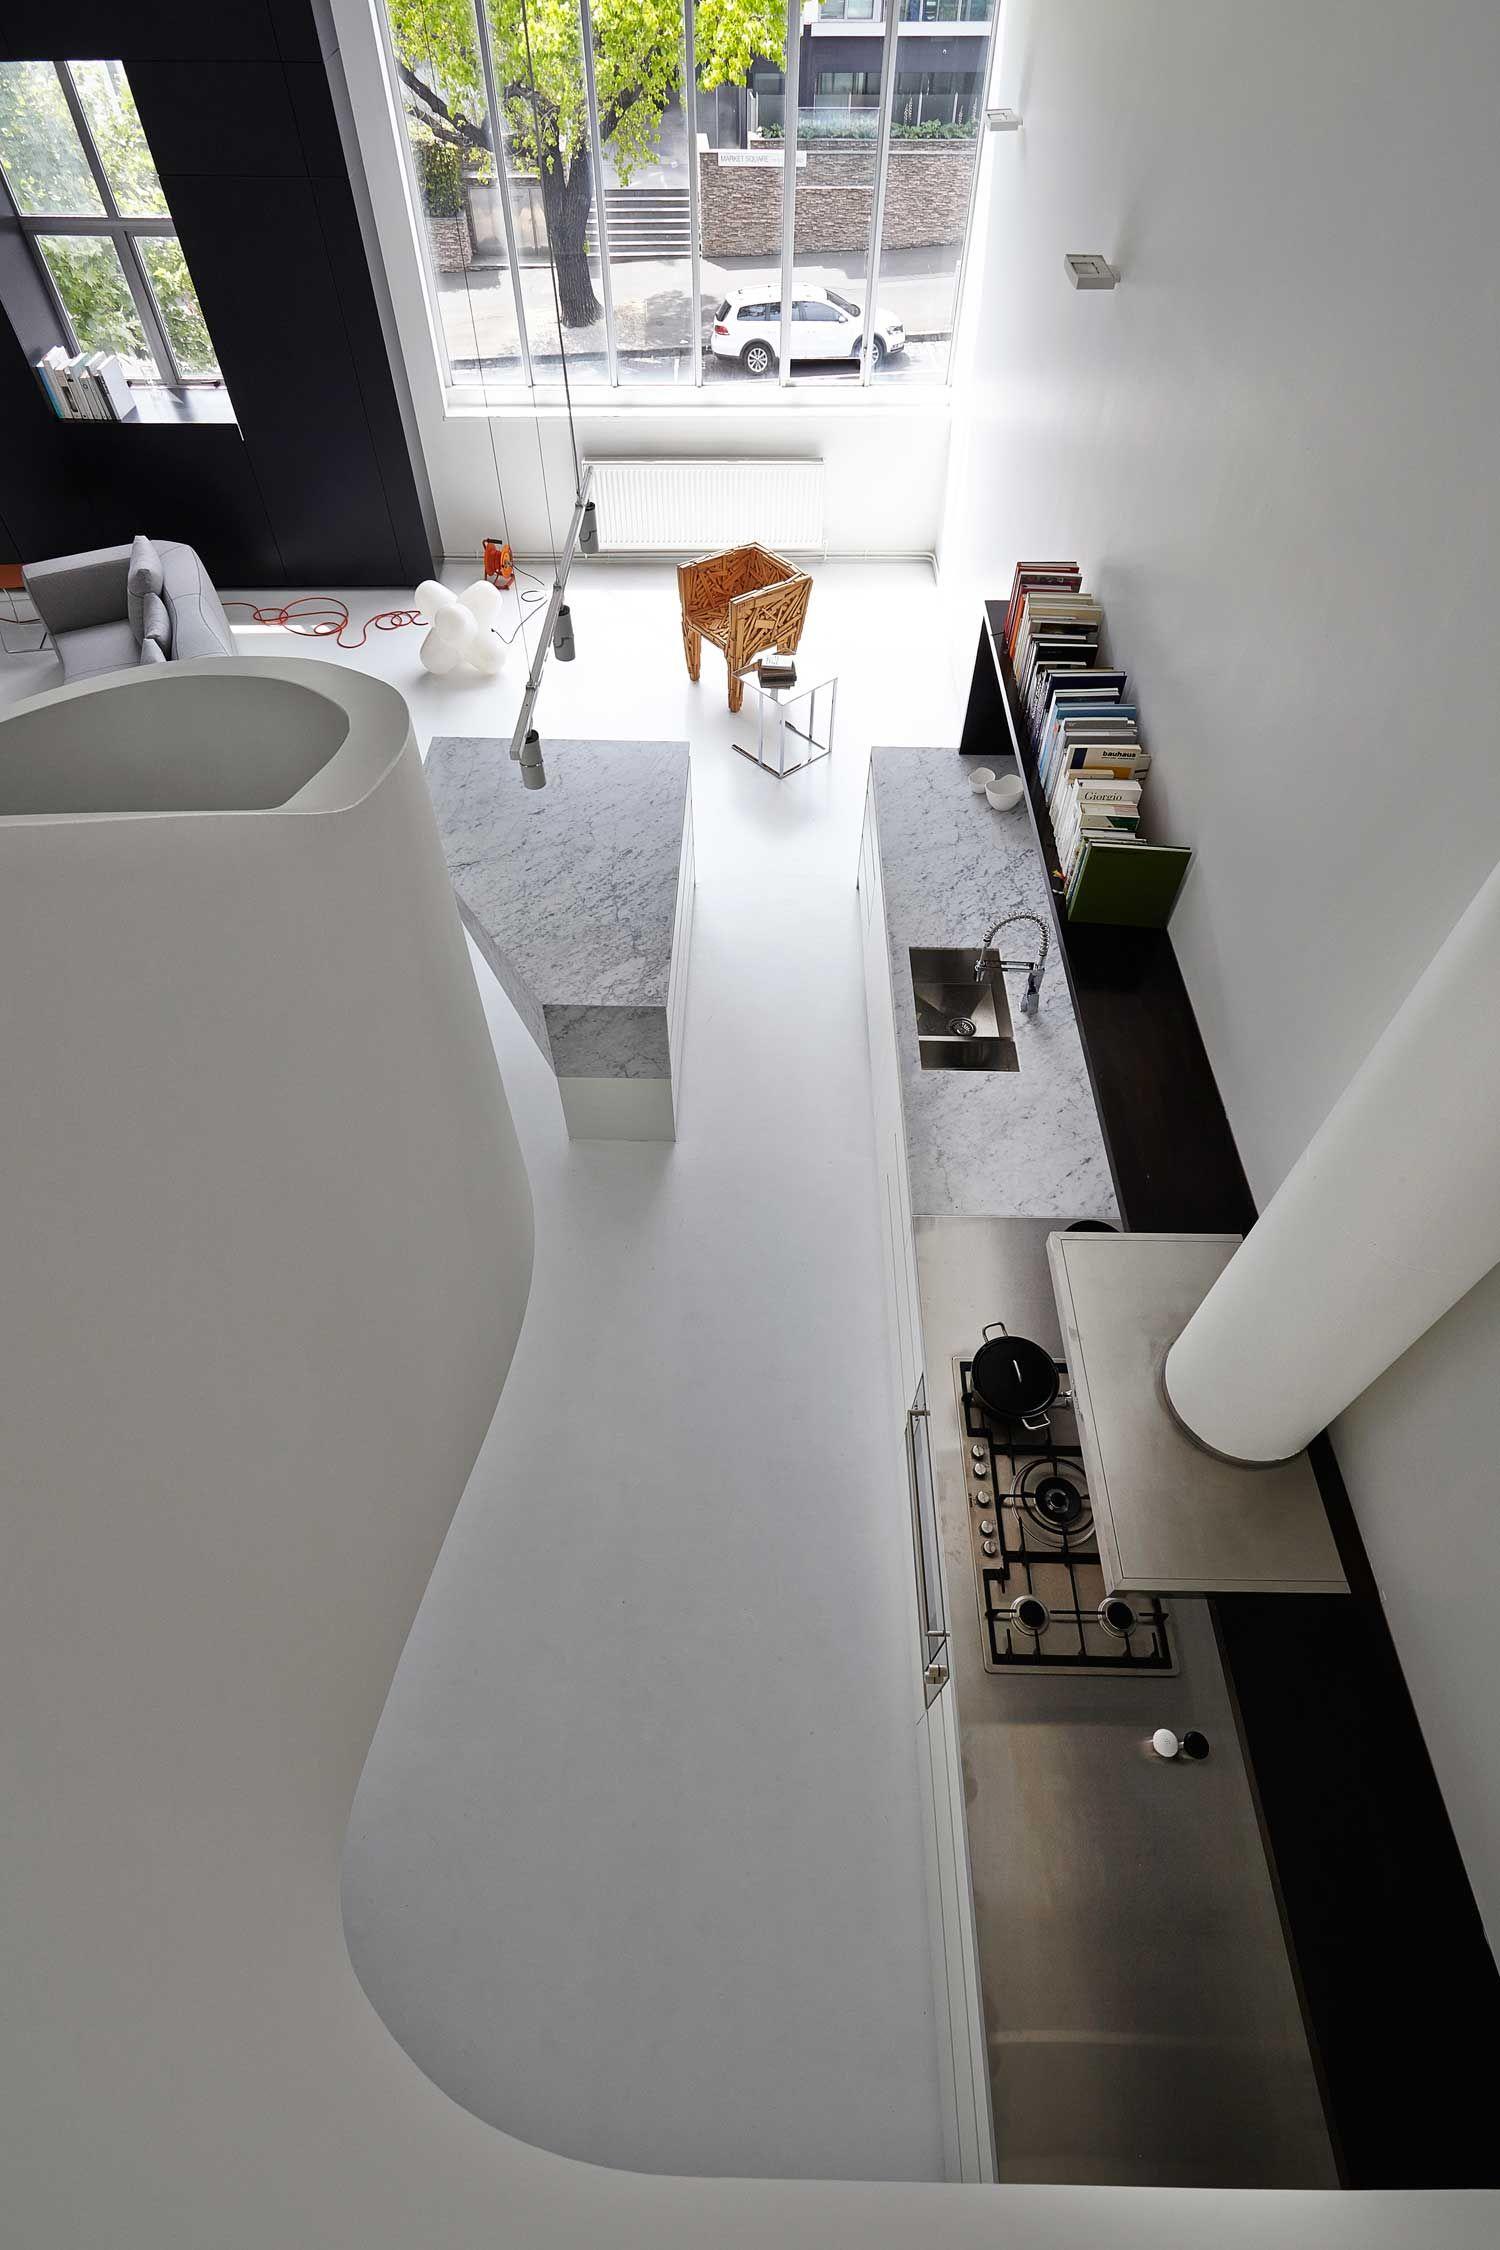 Adrian Amore Loft Apartment in West Melbourne   http://www.yellowtrace.com.au/2014/02/10/adrian-amore-loft-apartment-melbourne/